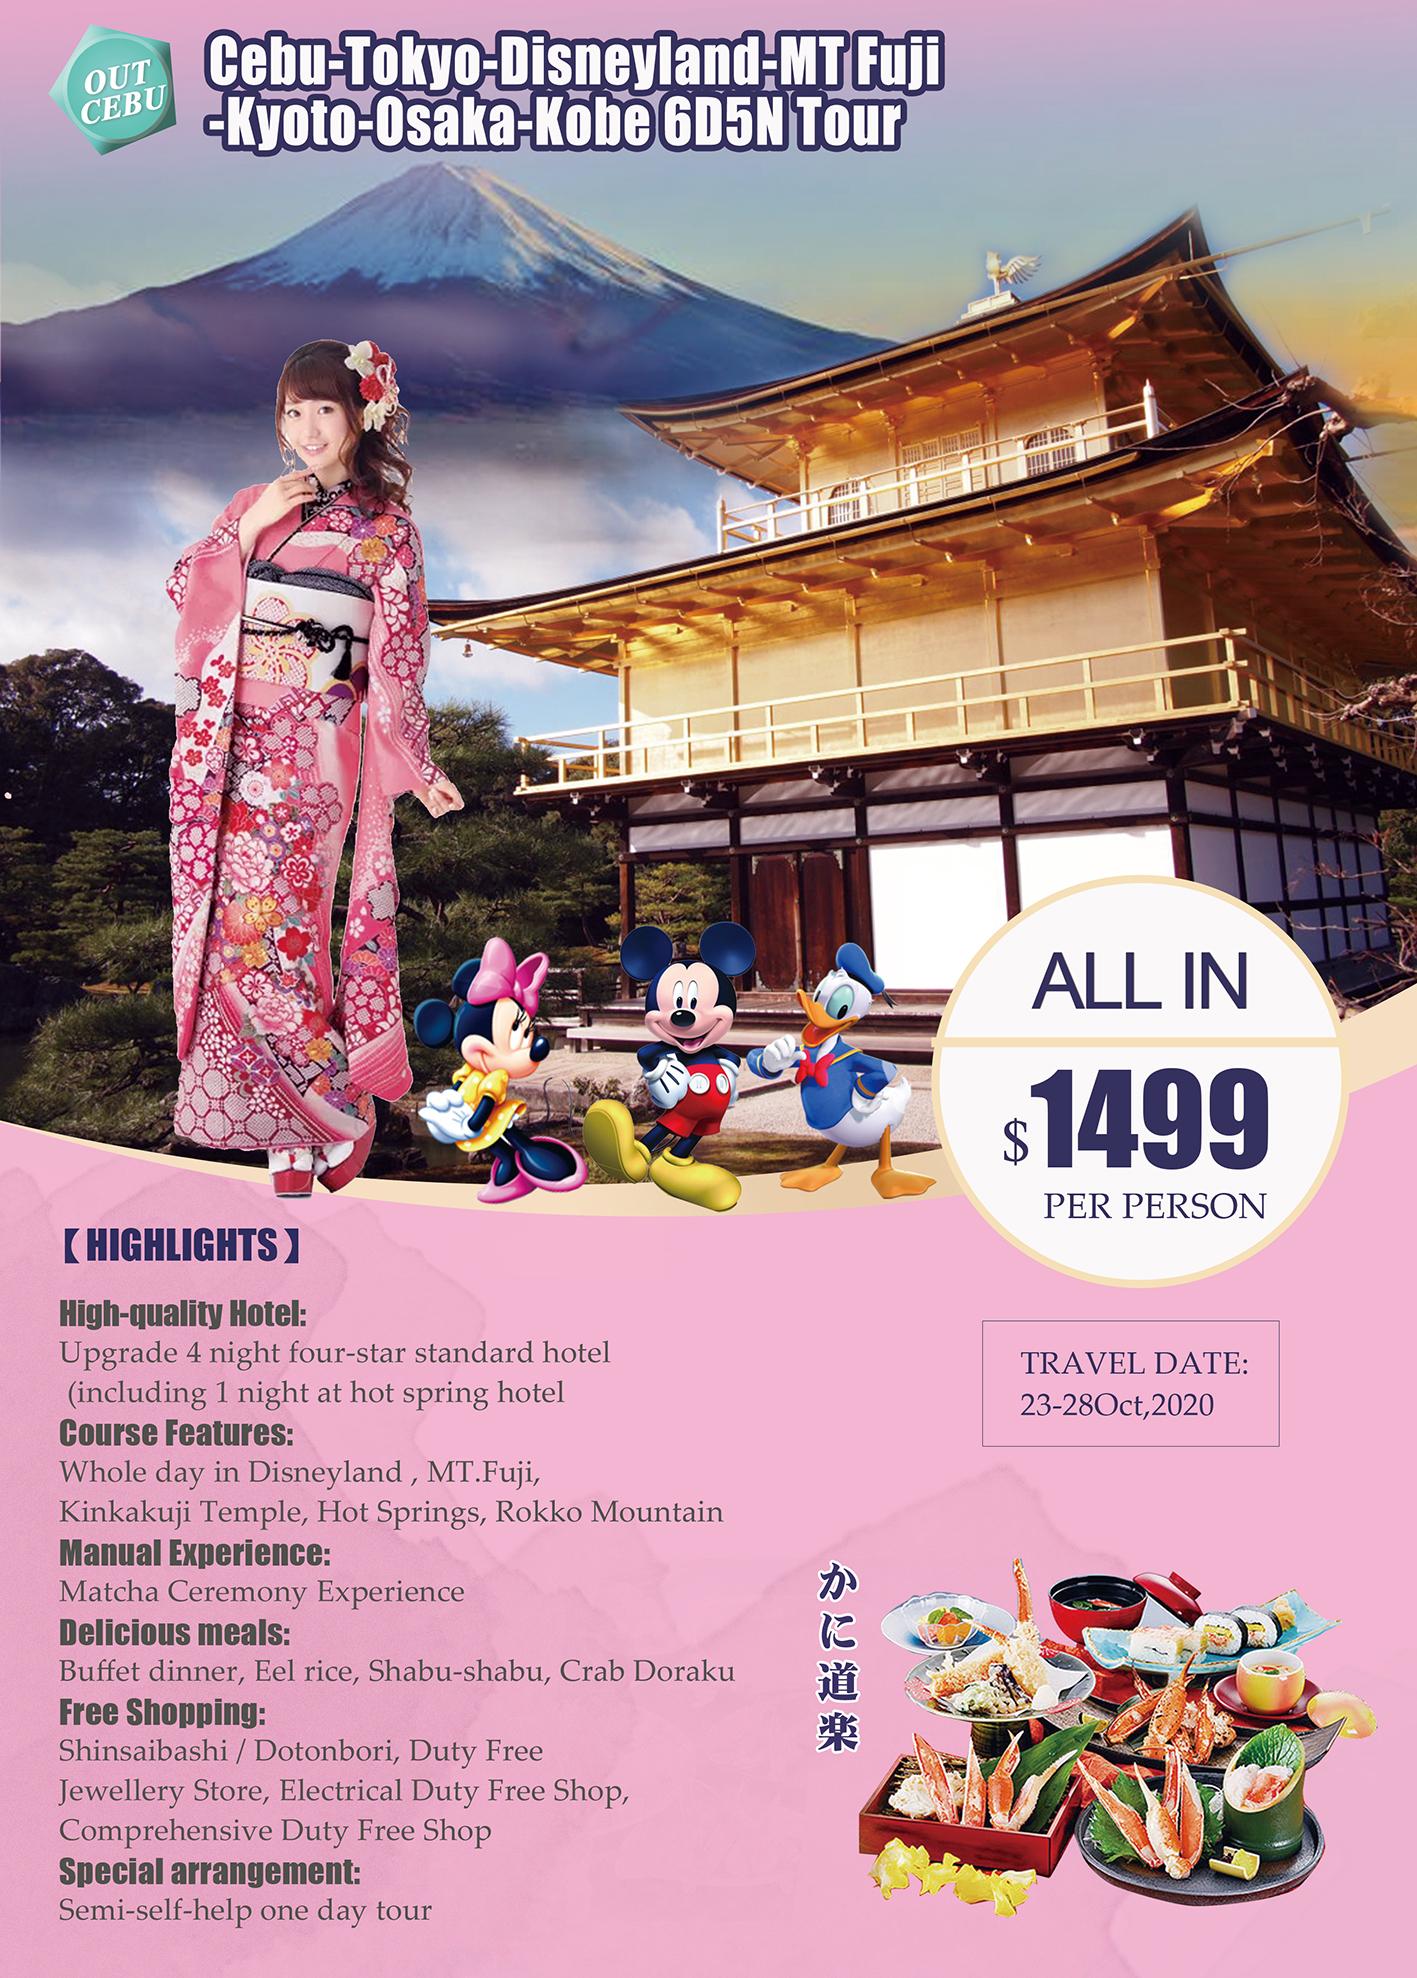 Oct 23rd,Cebu out, Tokyo Osaka 6D5N USD1499(1)